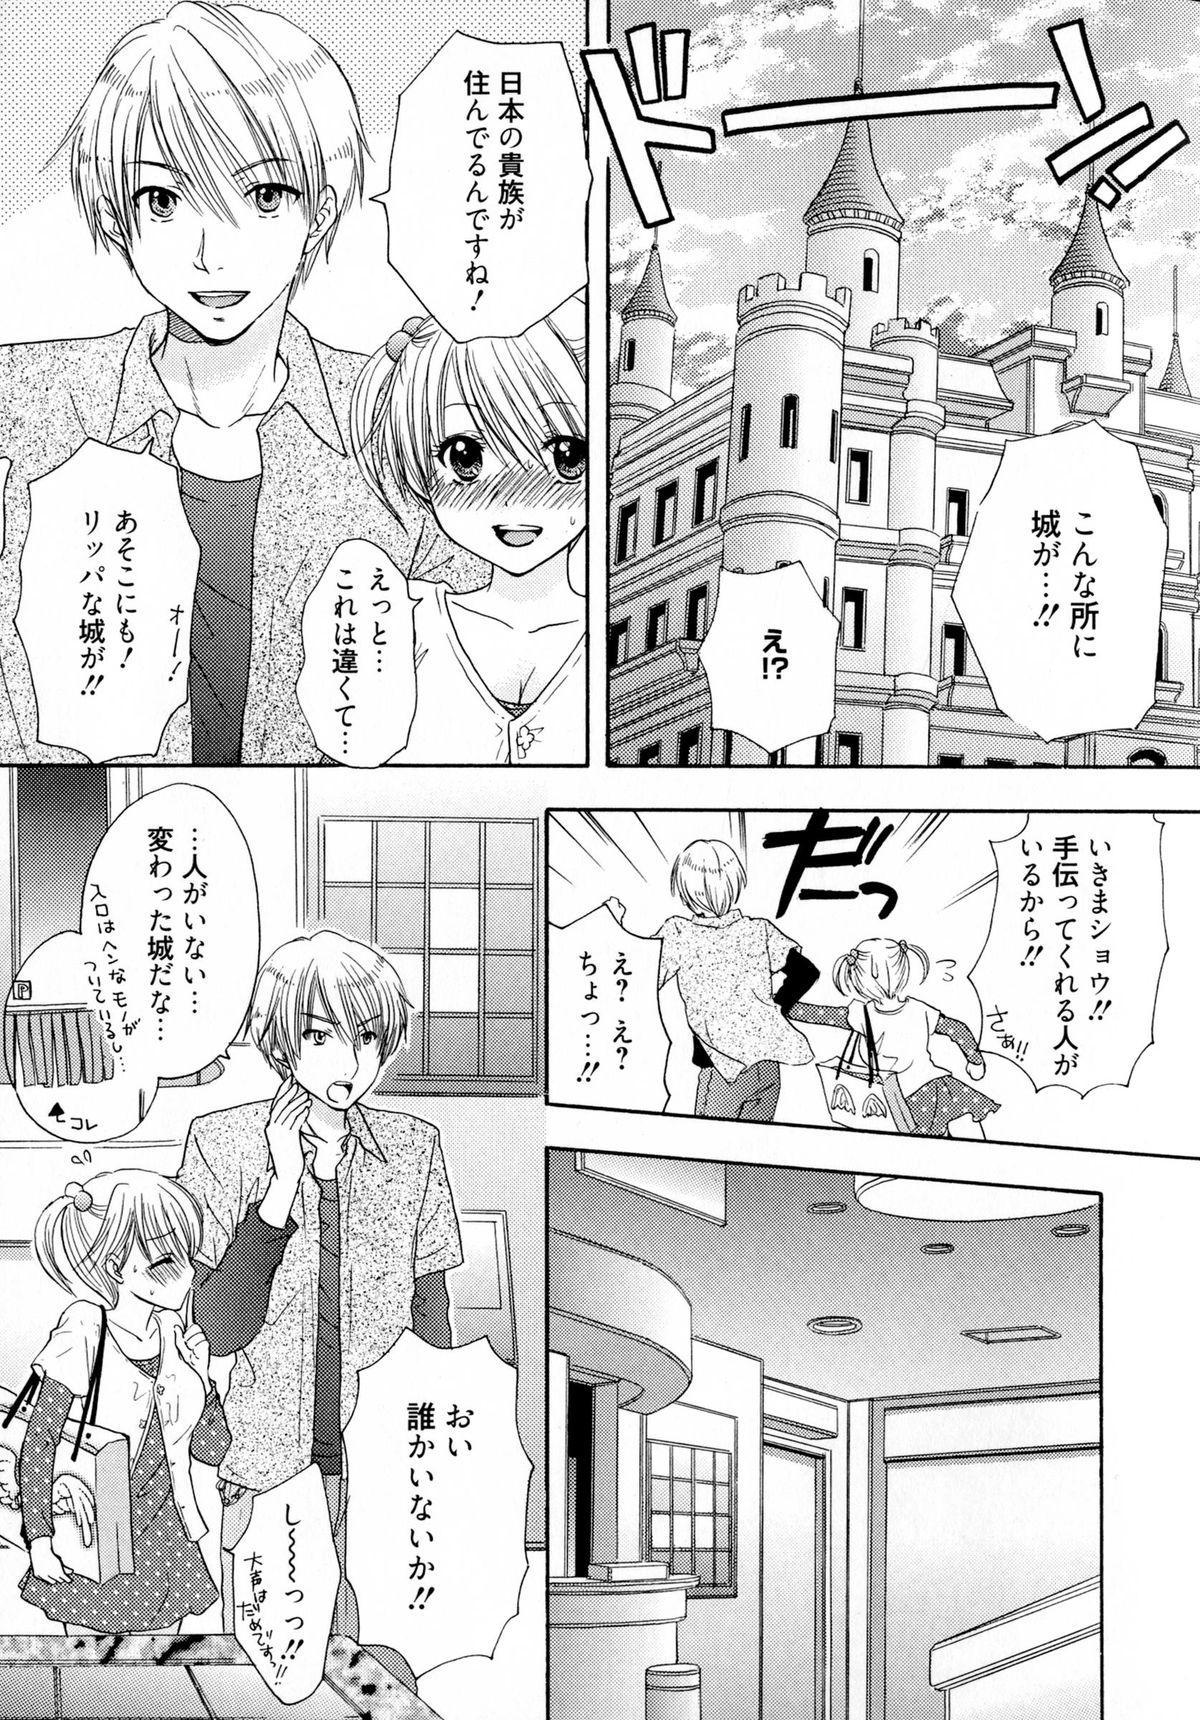 The Great Escape 4 Shokai Genteiban 154